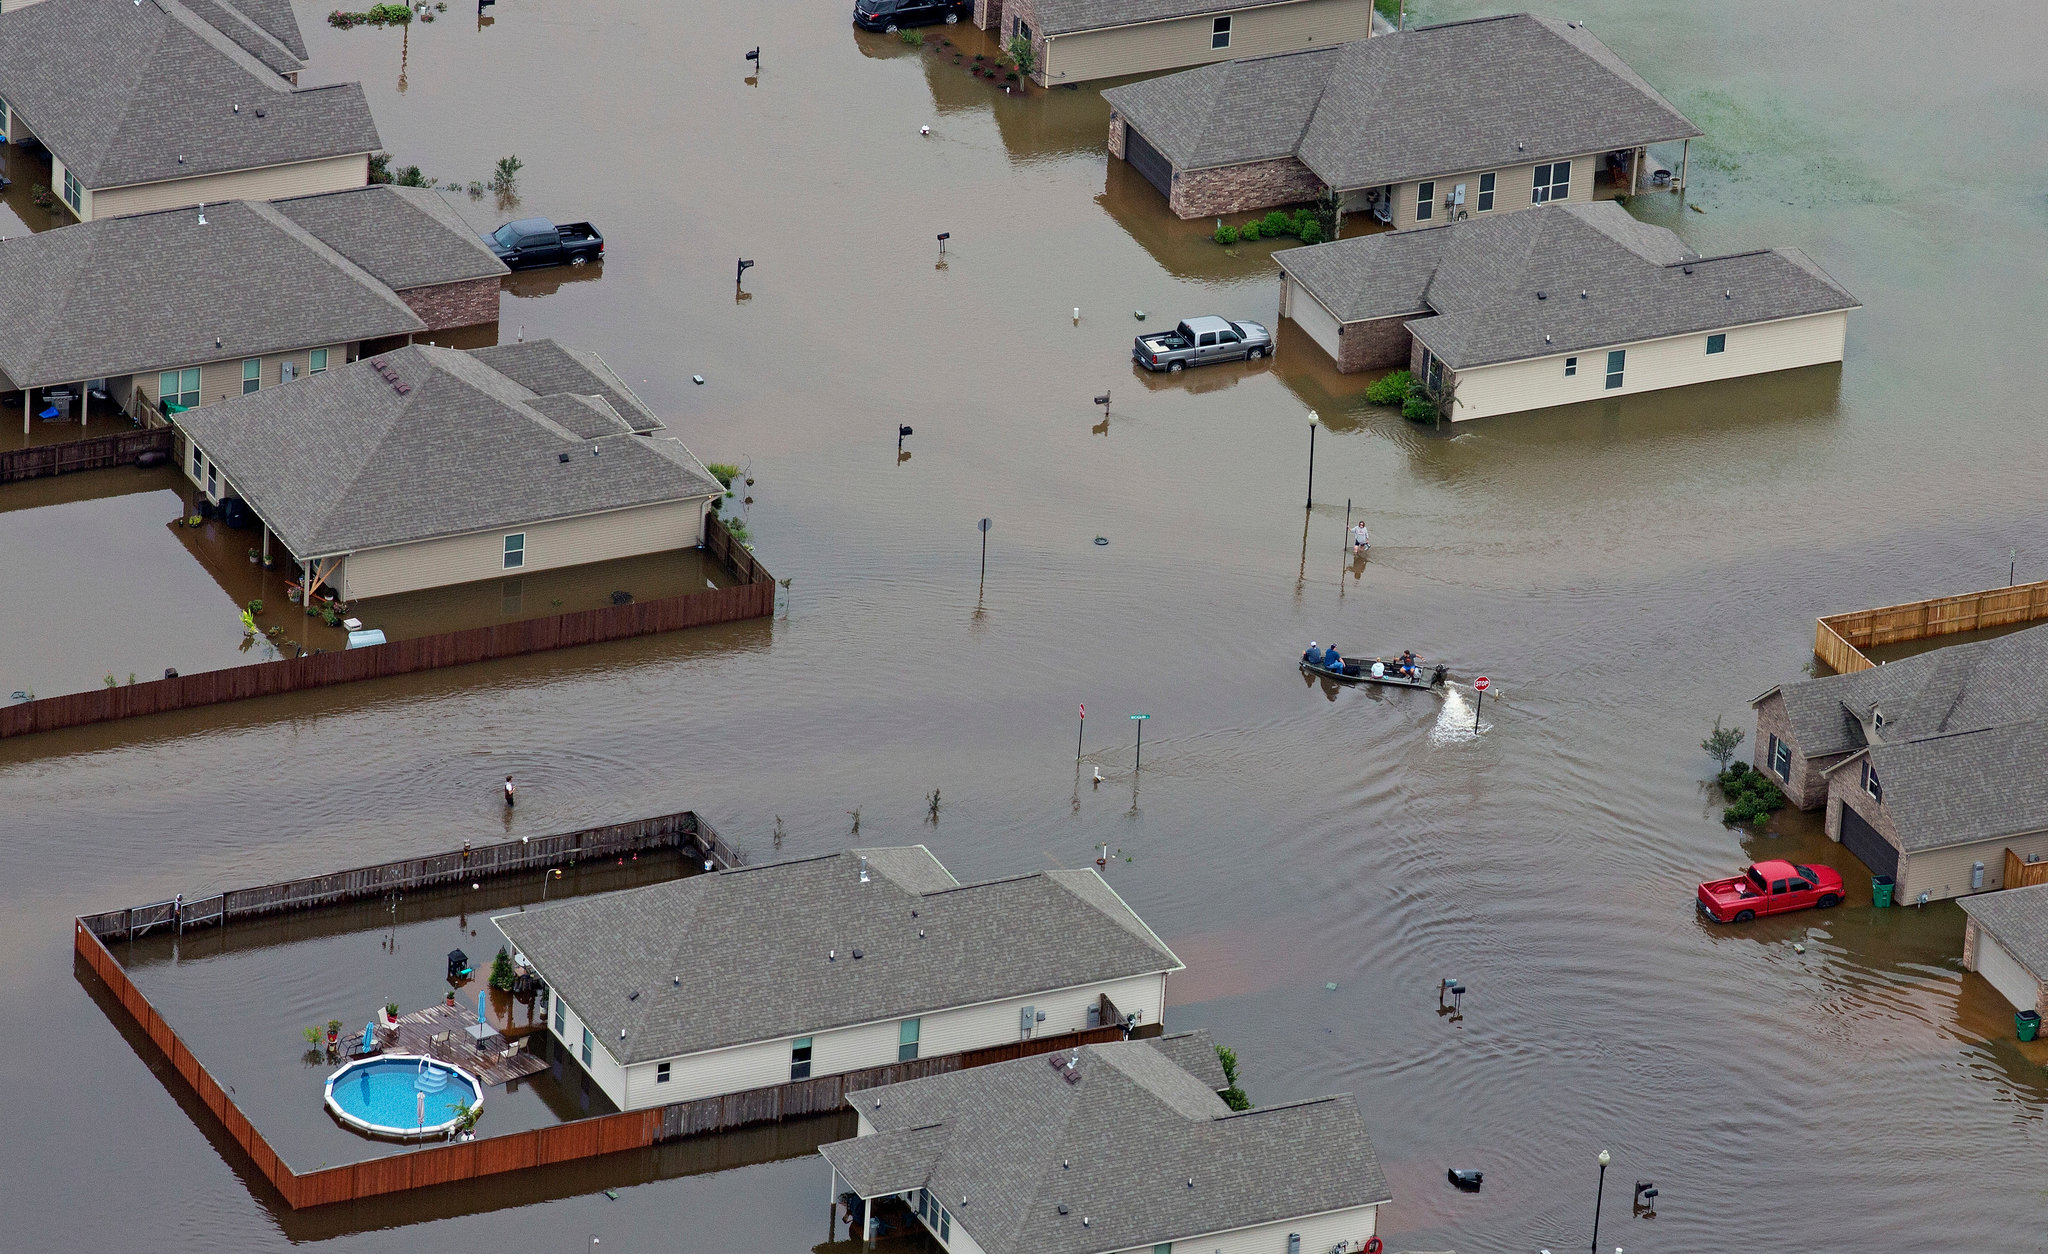 Boats motored along flooded streets in Hammond, La., on Saturday. Credit Max Becherer/FR 171354AP, via Associated Press..